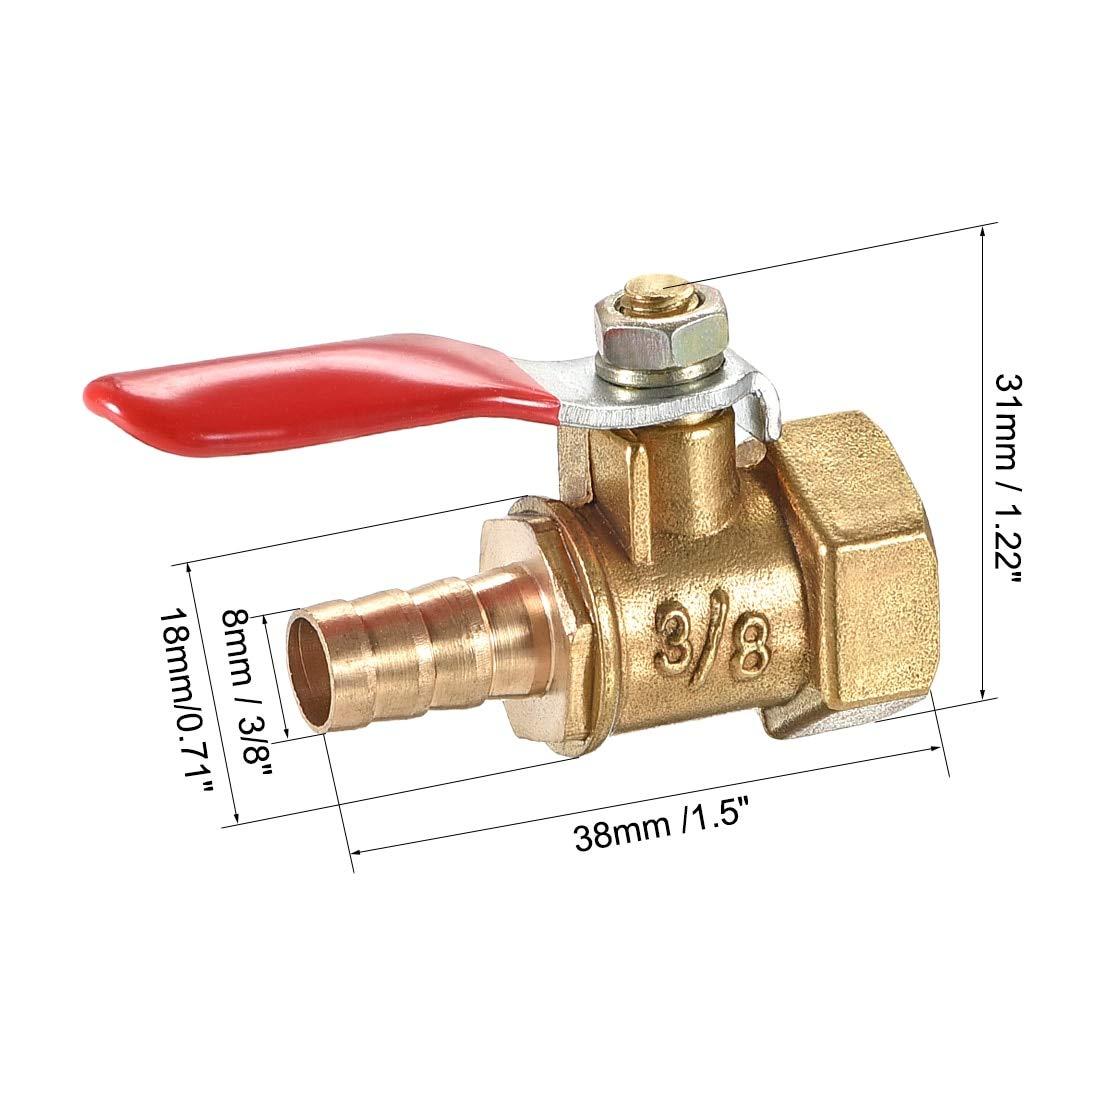 Brass Air Ball Valve Shut Off Switch G3//8 Female to 5//16 Hose Barb 4Pcs